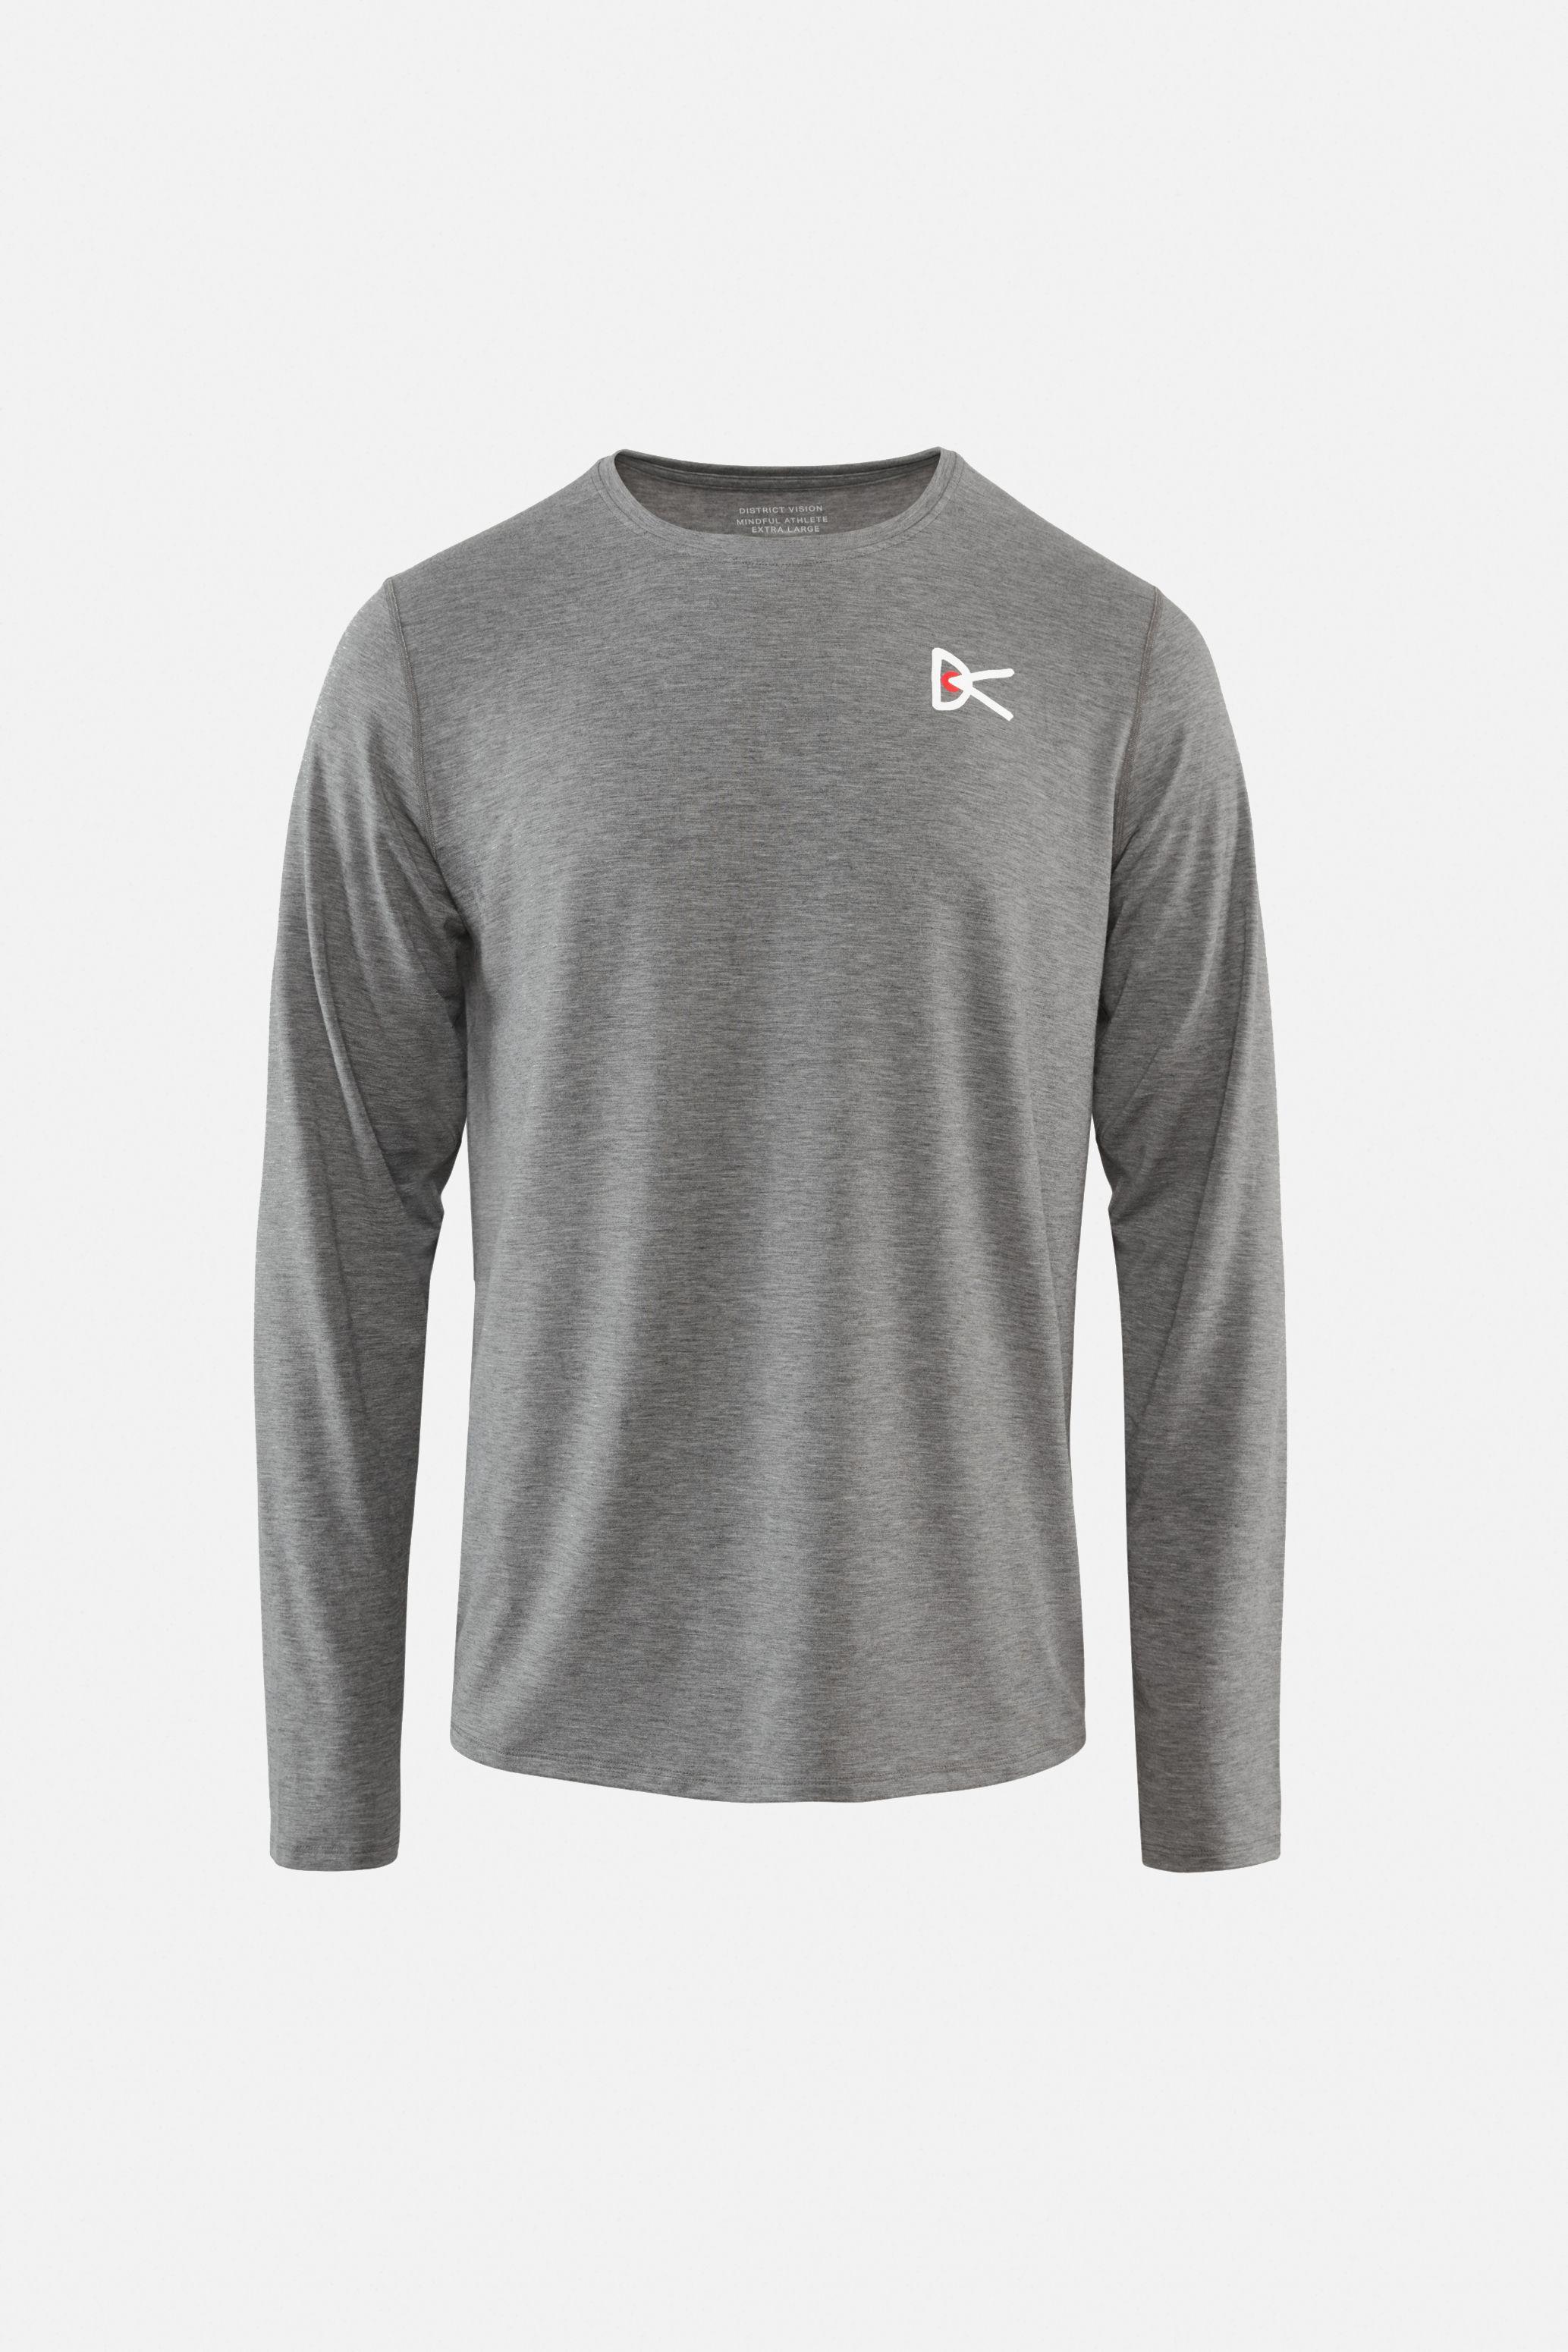 Tadasana Long Sleeve T-Shirt, Dark Gray